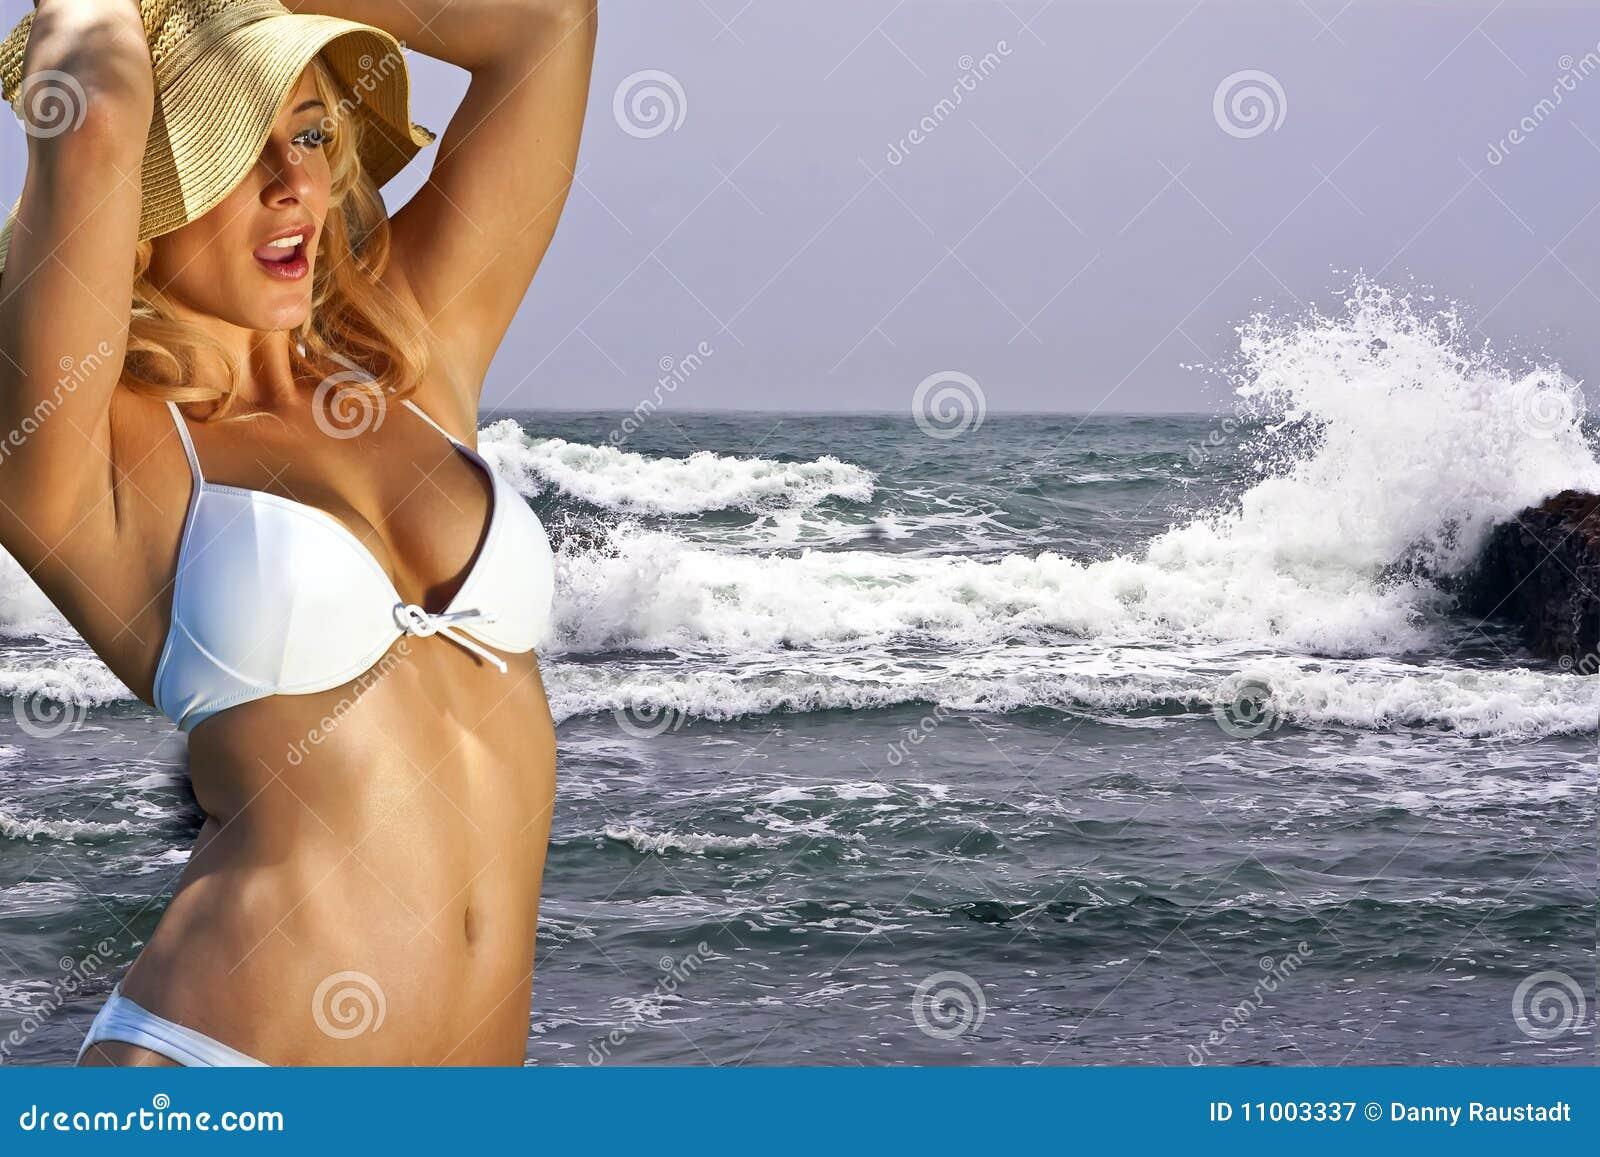 Young blonde bikini at Big Sur, Caifornia, USA